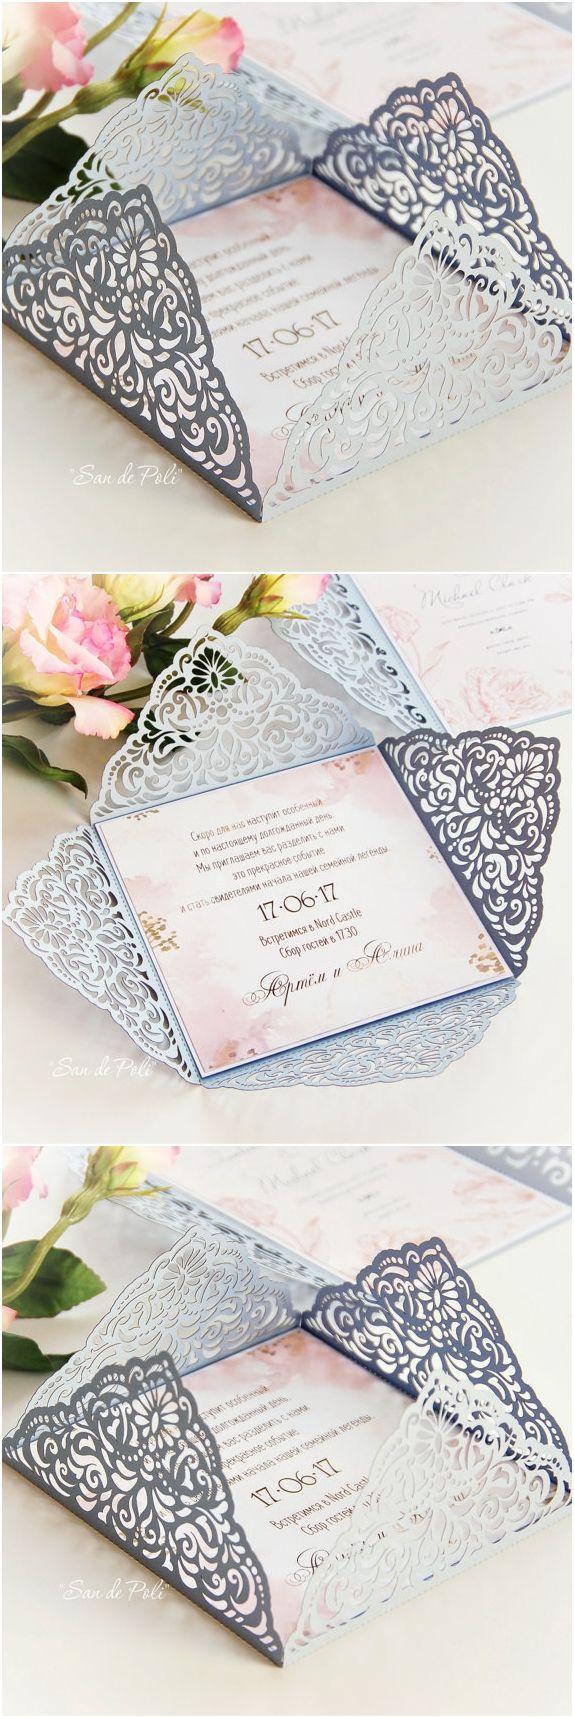 Wedding Invitation Card Template Four Fold Filigree Envelope Etsy Trouwen